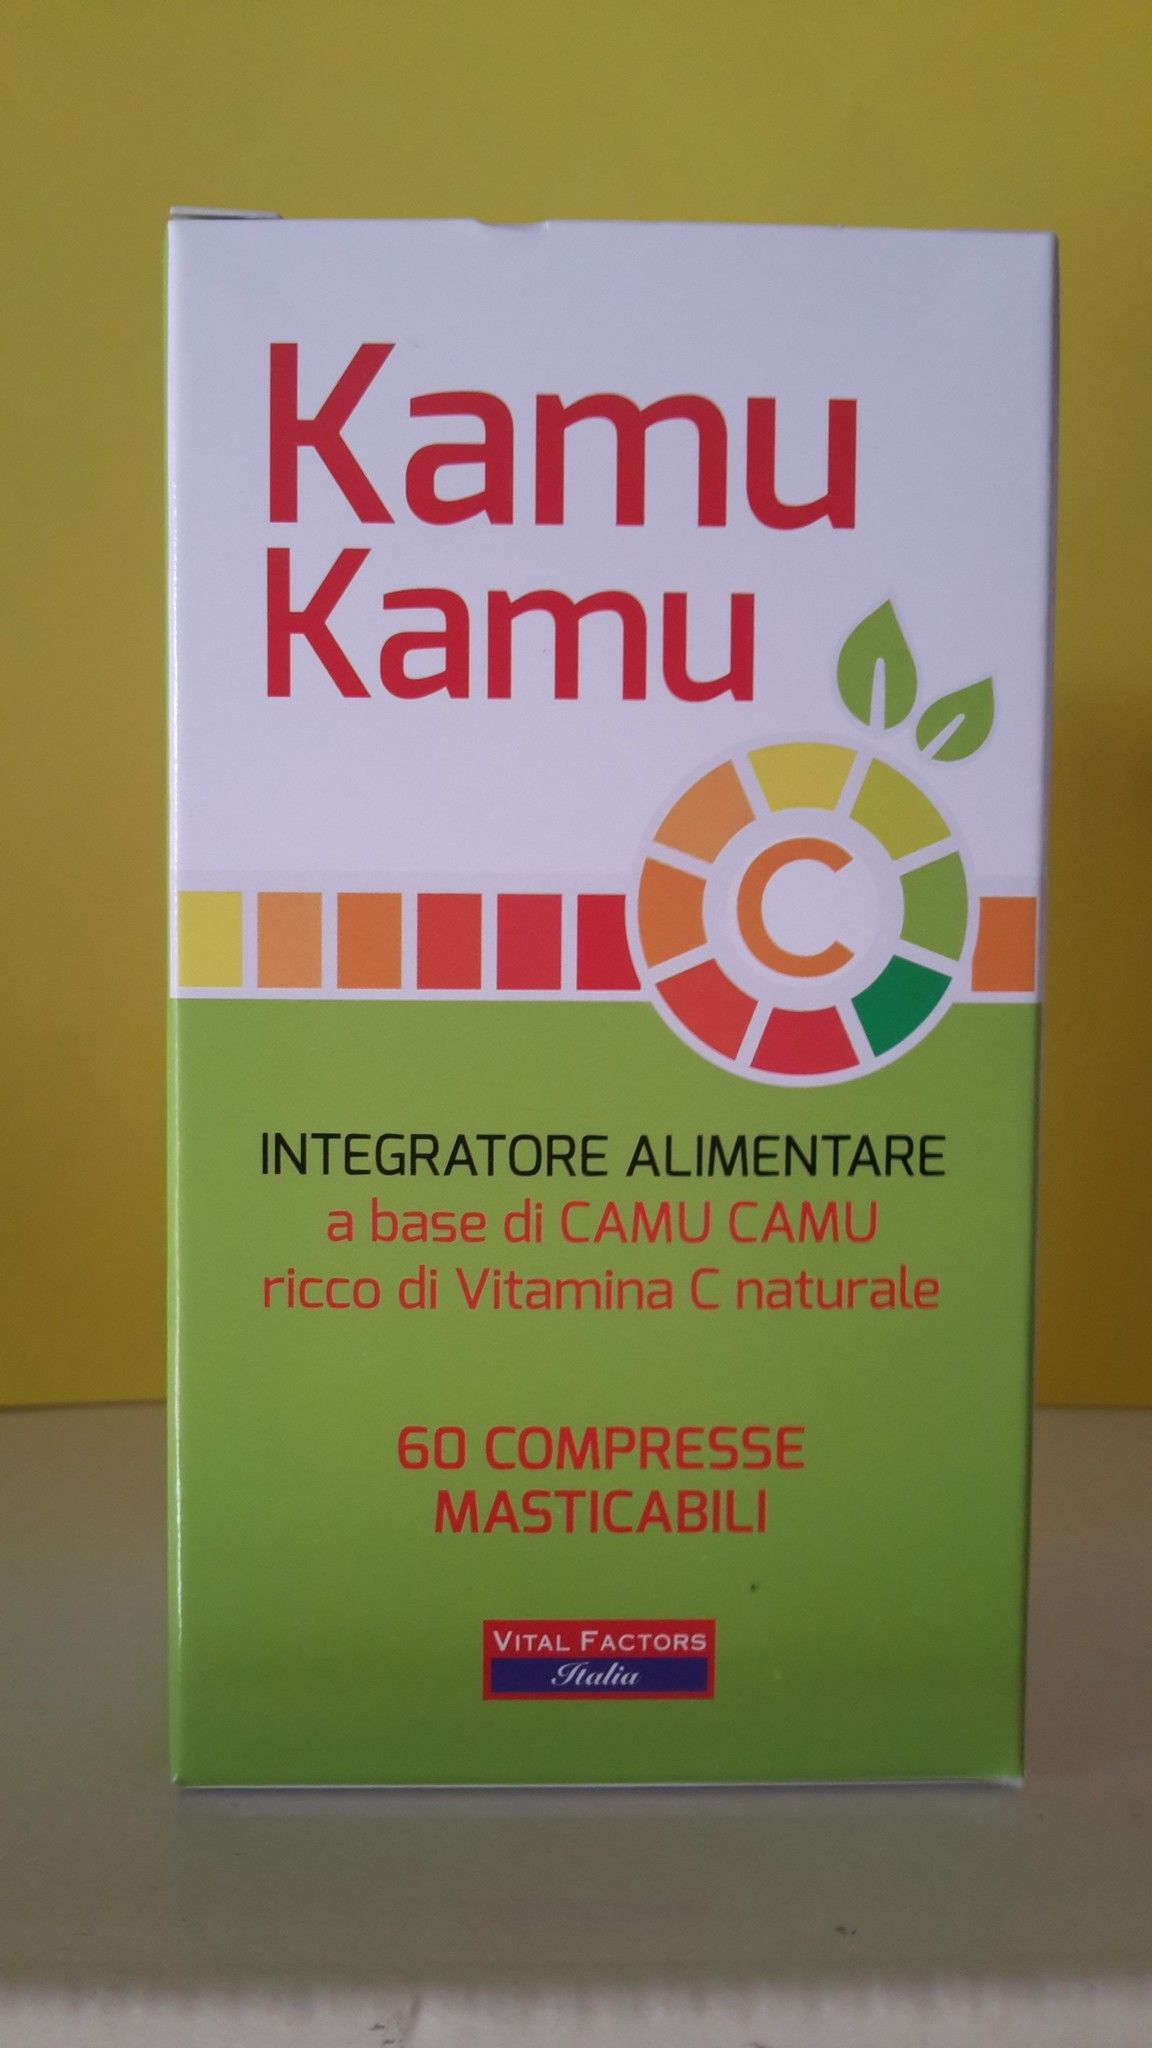 Kamu Kamu  Vitamina C -  60  cpr  Masticabili - VITAL FACTORS